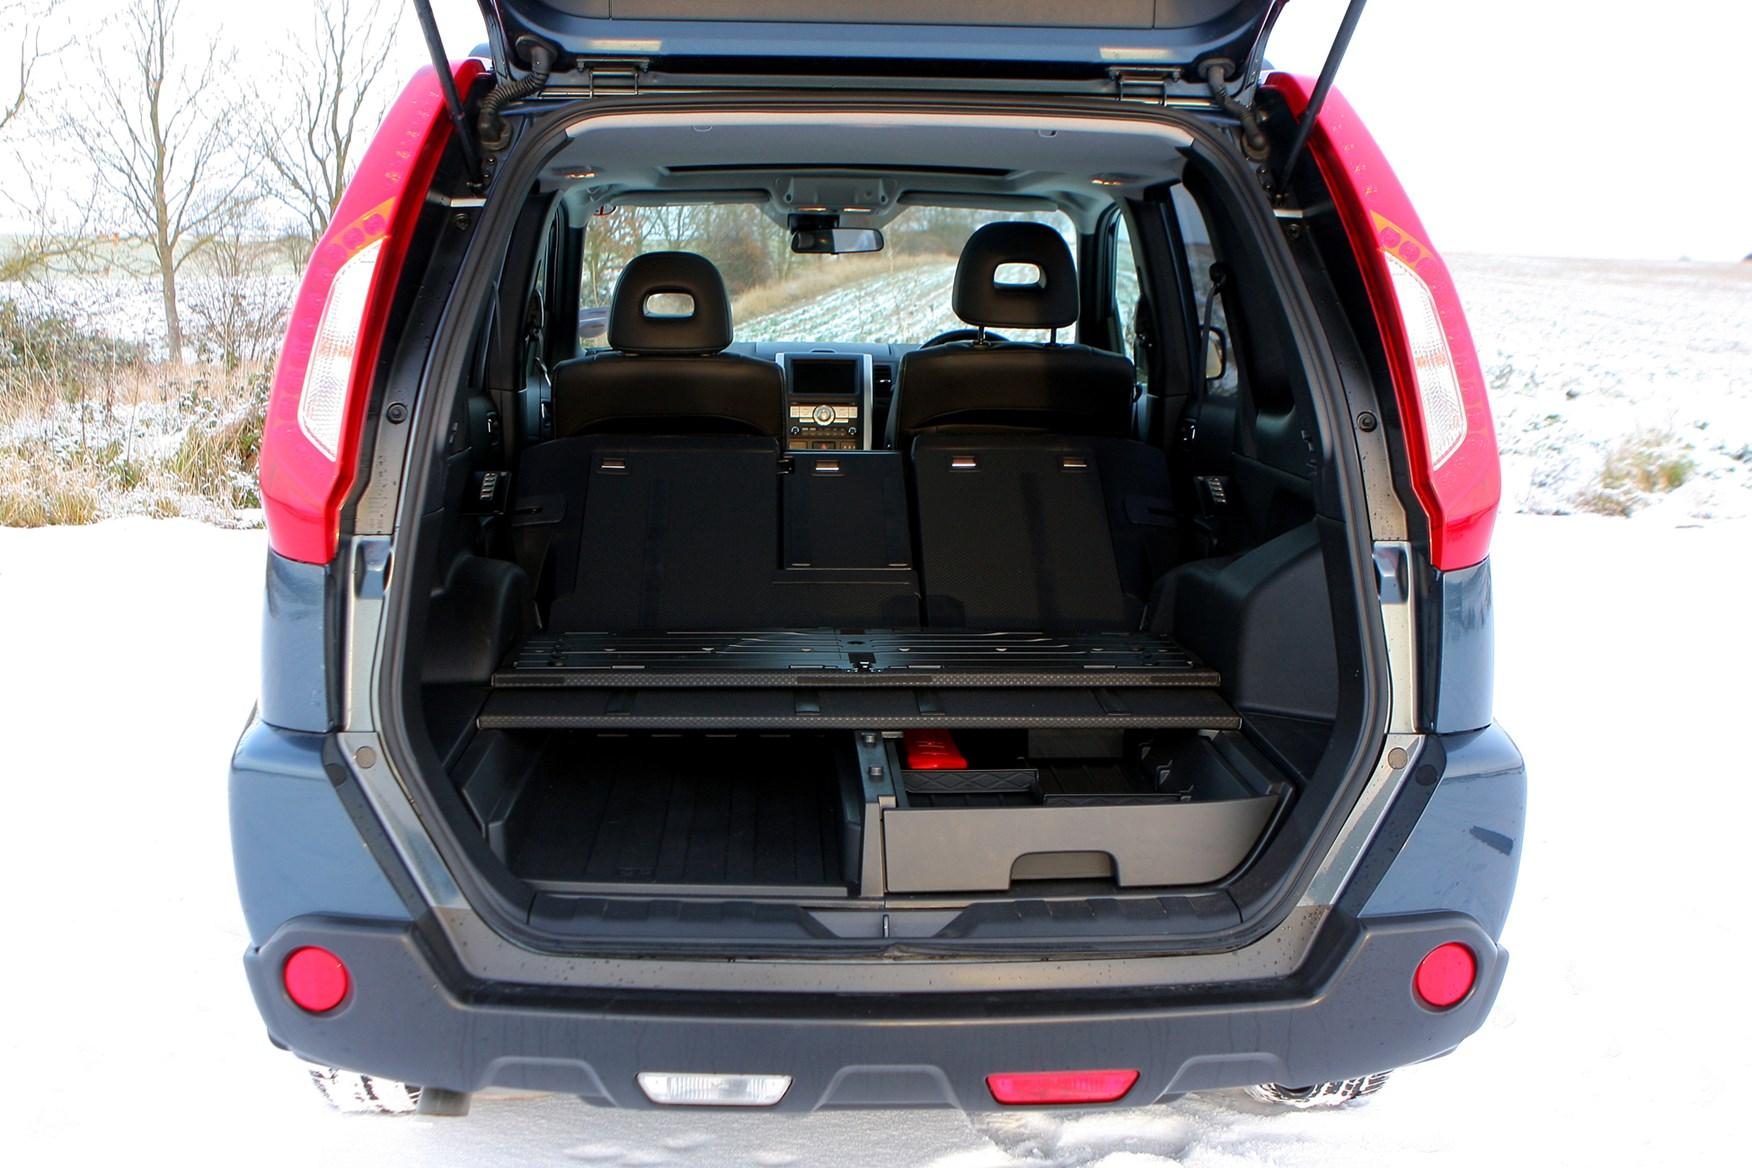 nissan x trail station wagon 2007 2014 photos parkers. Black Bedroom Furniture Sets. Home Design Ideas